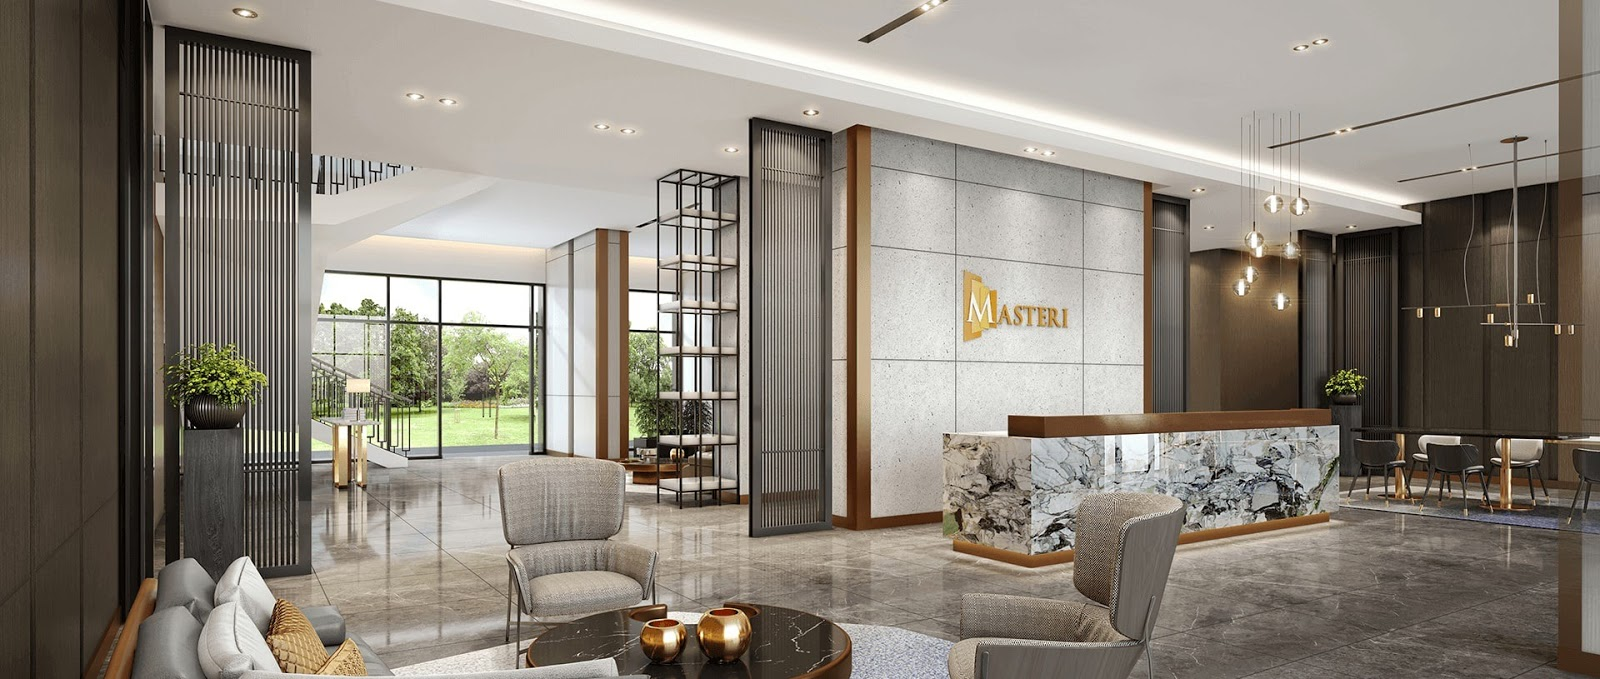 Sảnh Lounge tiêu chuẩn 5 sao tại Masteri Smart City